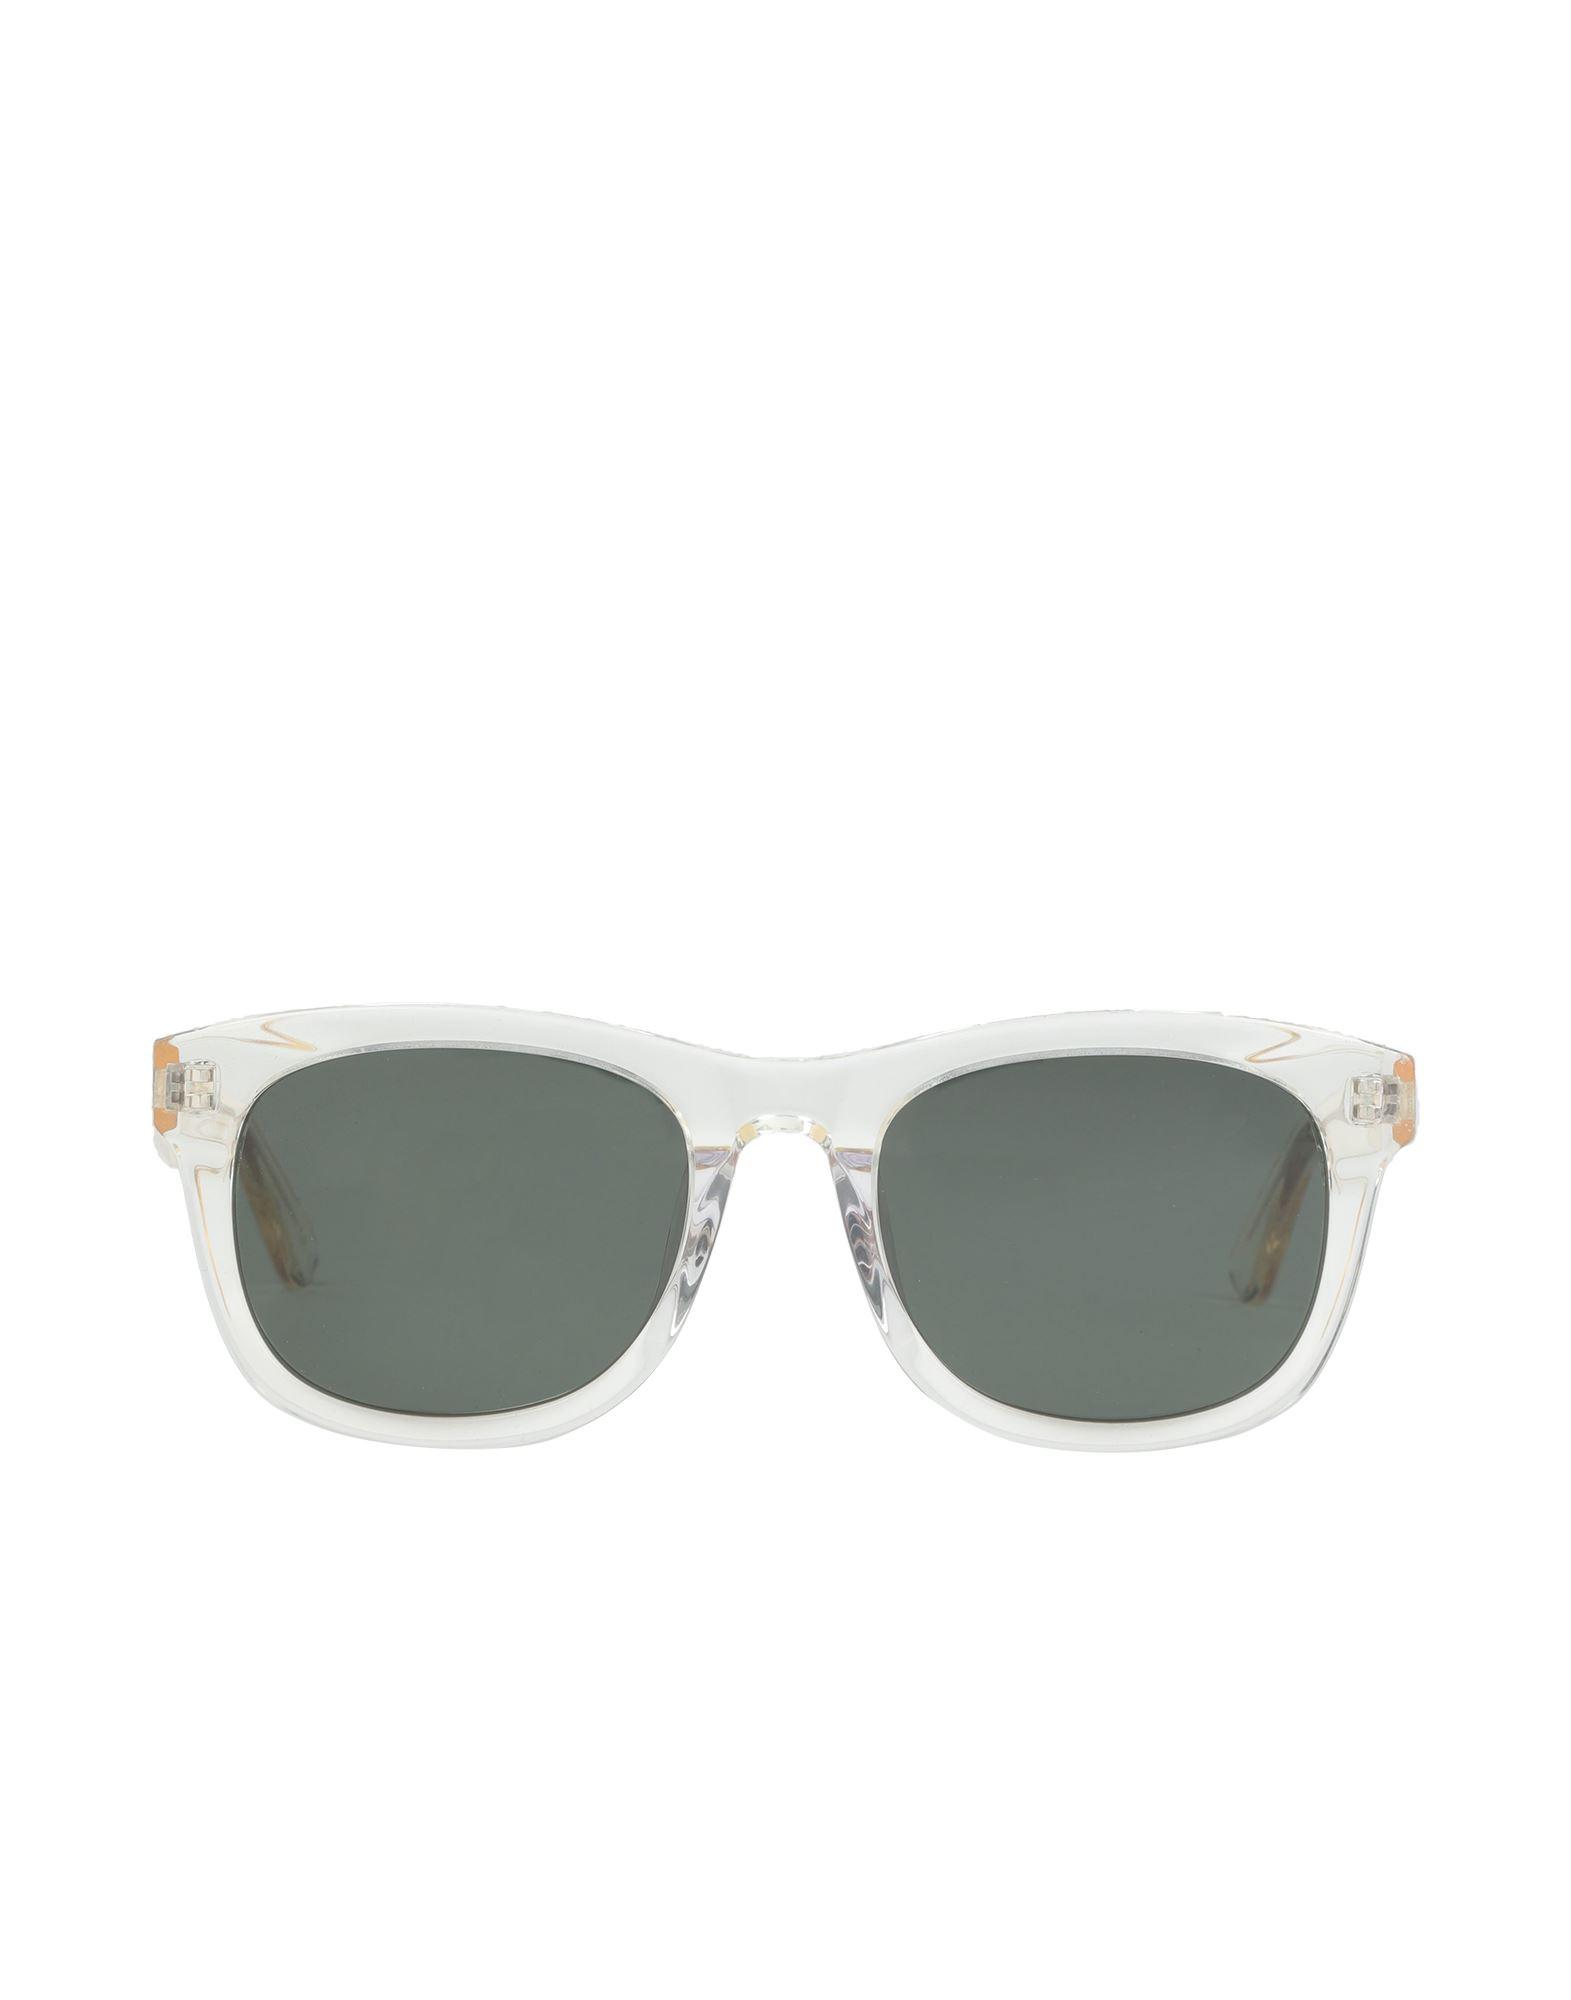 HAN KJØBENHAVN Sunglasses - Item 46737536